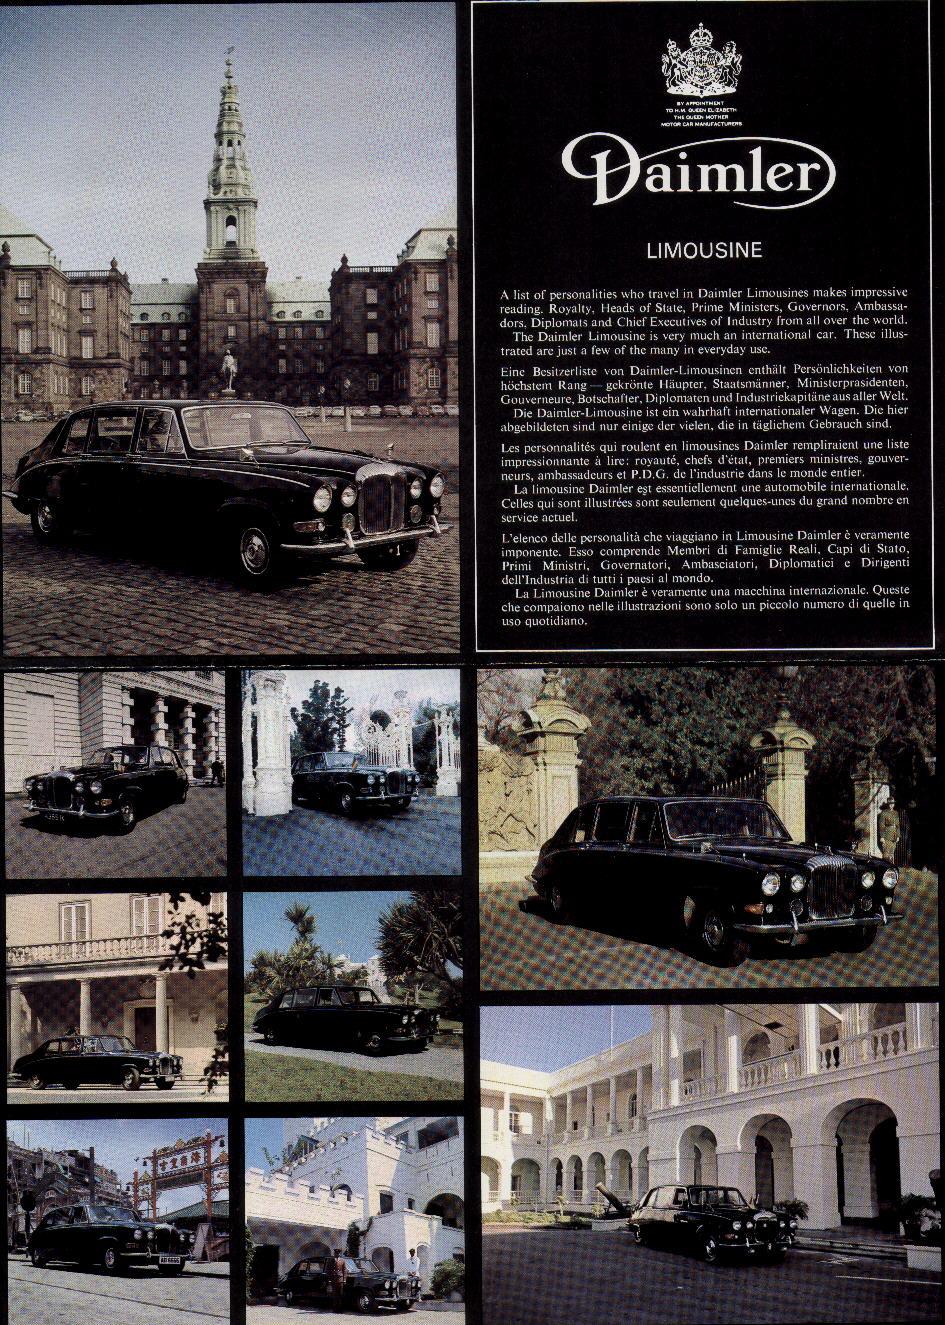 Daimler Limousine Brochure